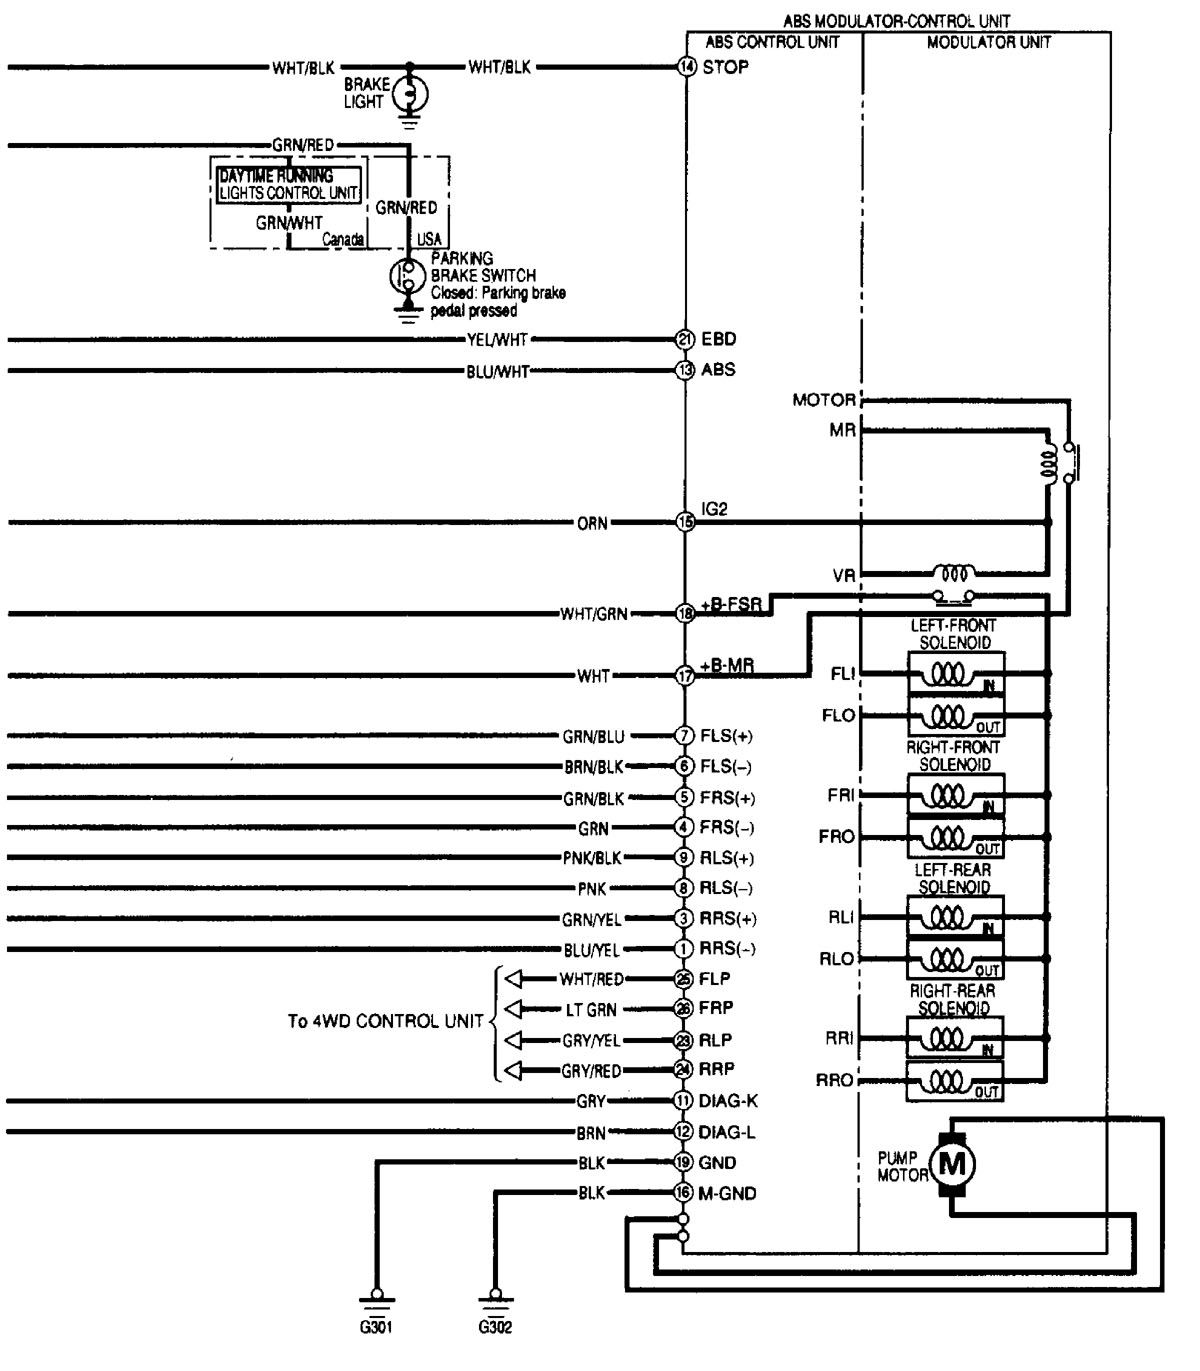 hight resolution of acura mdx 2001 wiring diagrams brake controls 2001 acura mdx fuse box diagram 2001 acura mdx fuse diagram